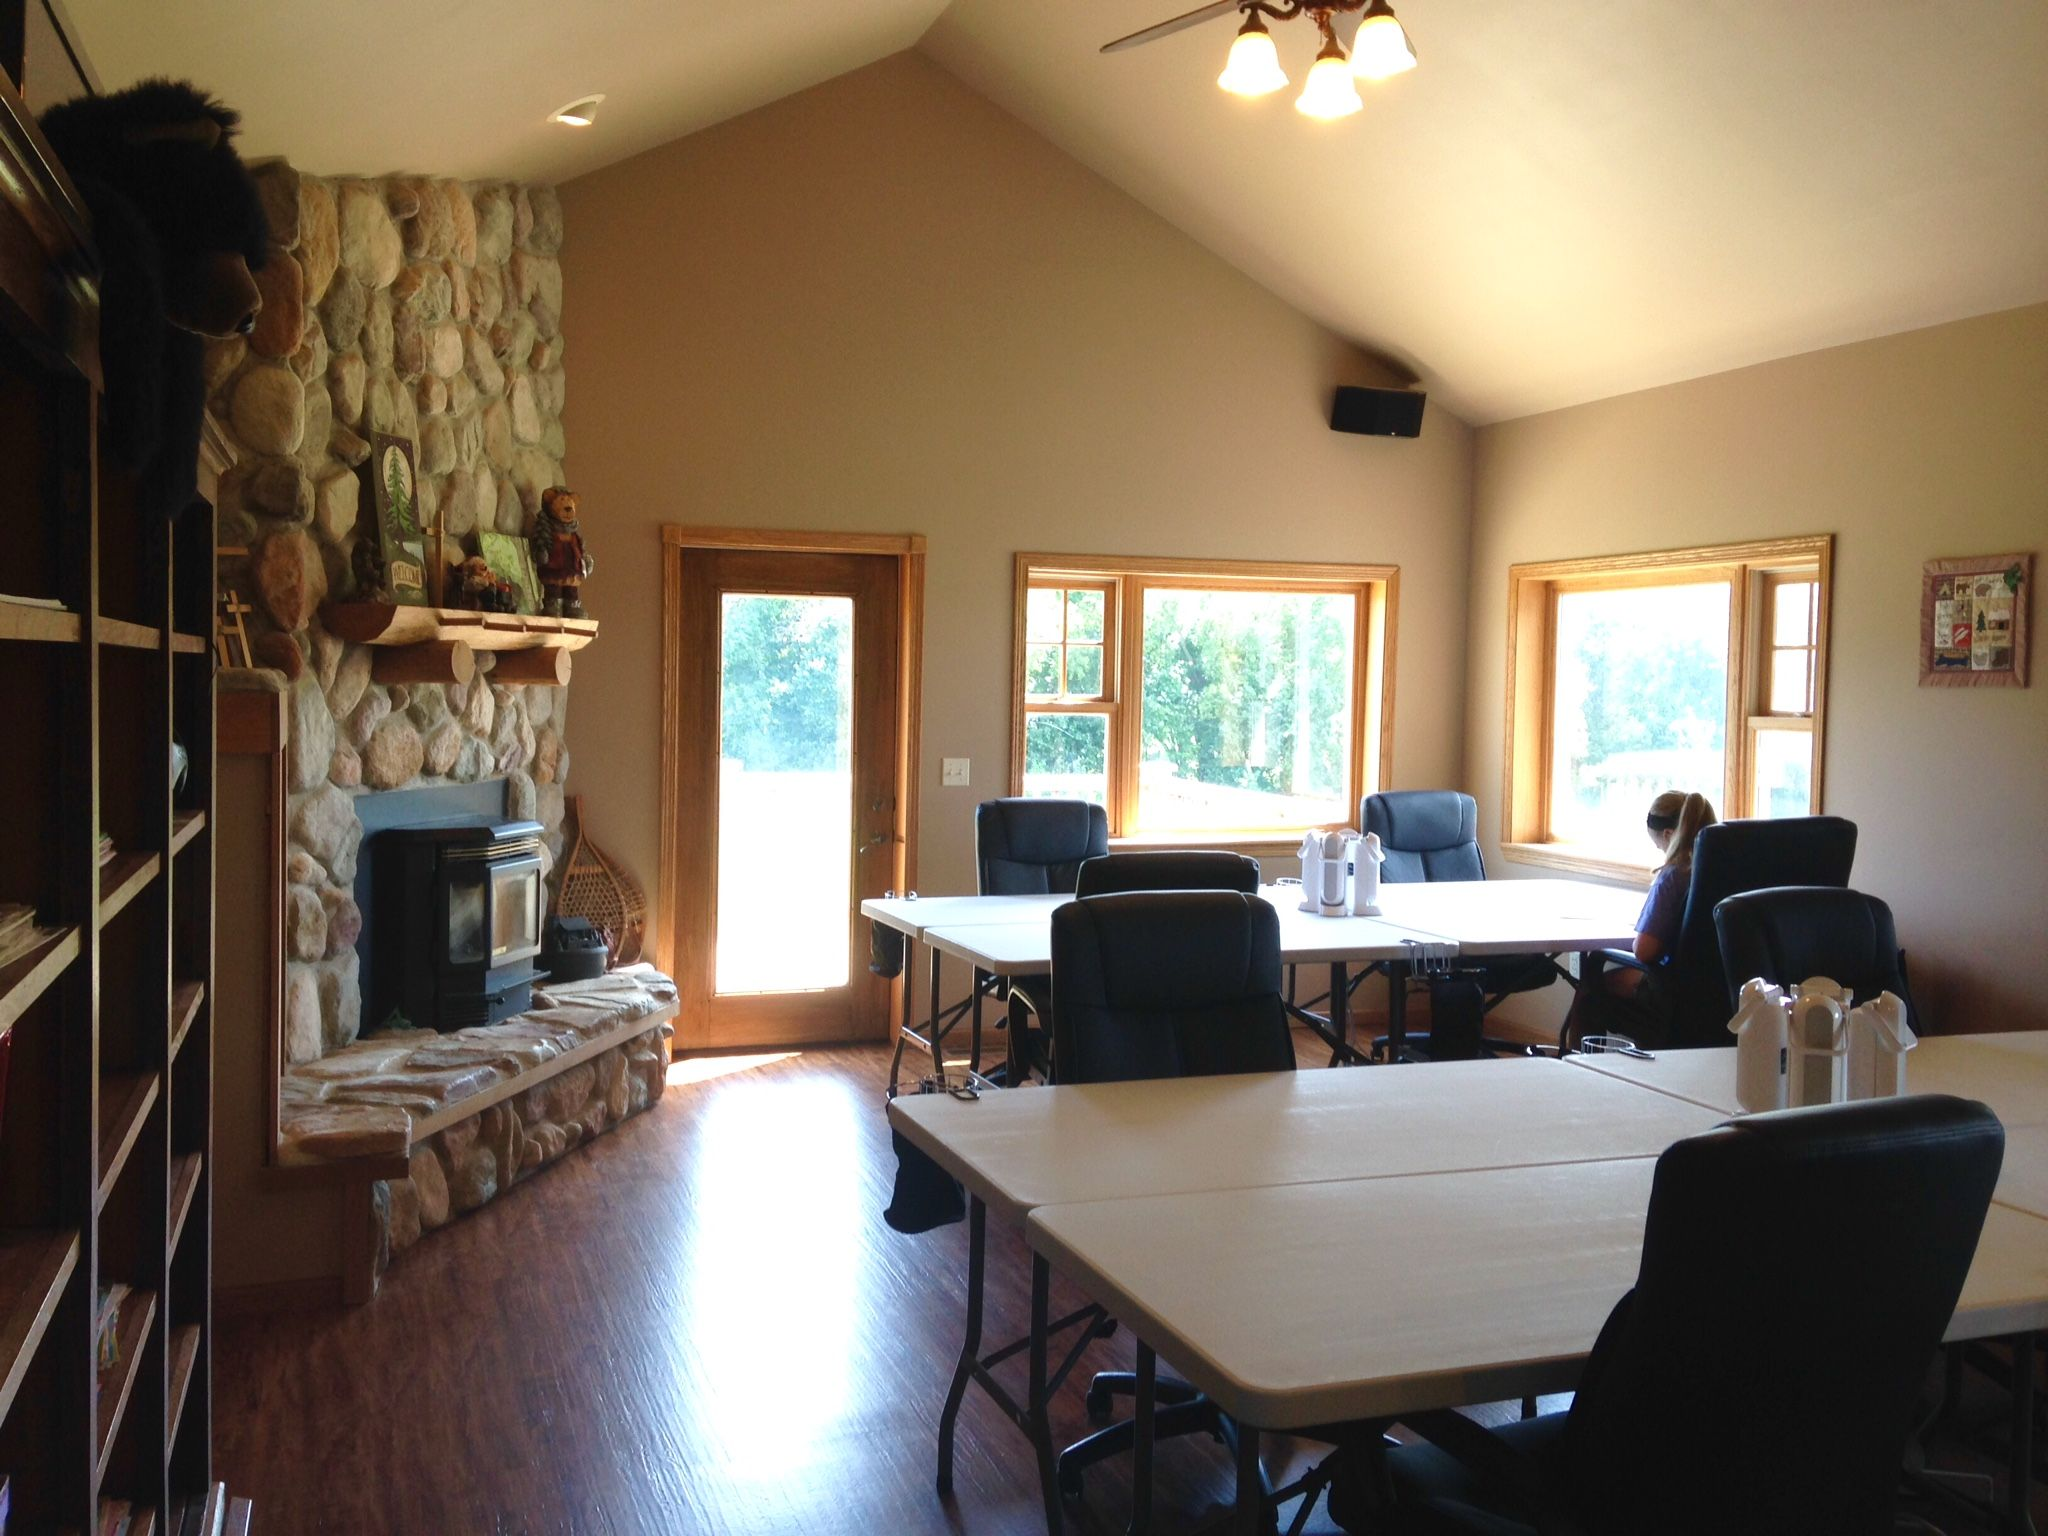 site oak cabins cabin lodging missouri type koa rentals kansas city in grove east campgrounds